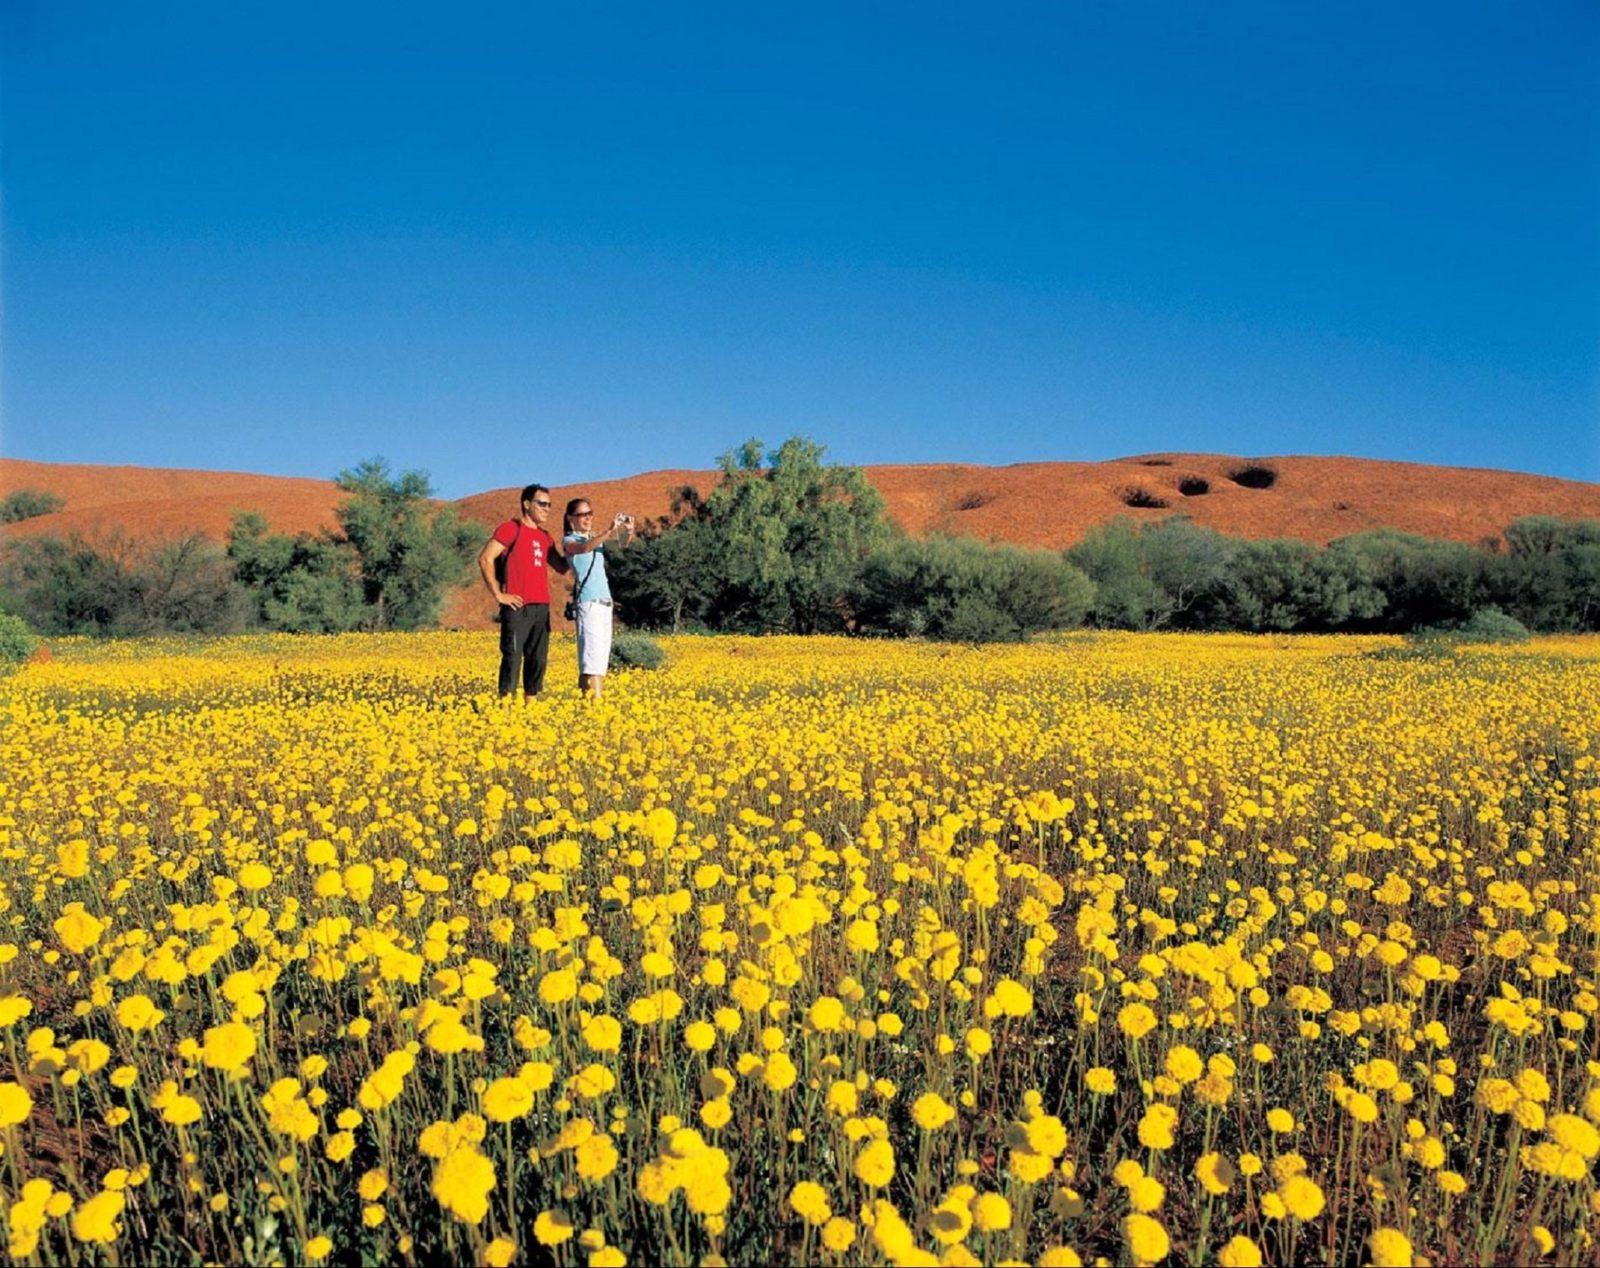 Coorow Farm Wildflower Trail, Coorow, Western Australia